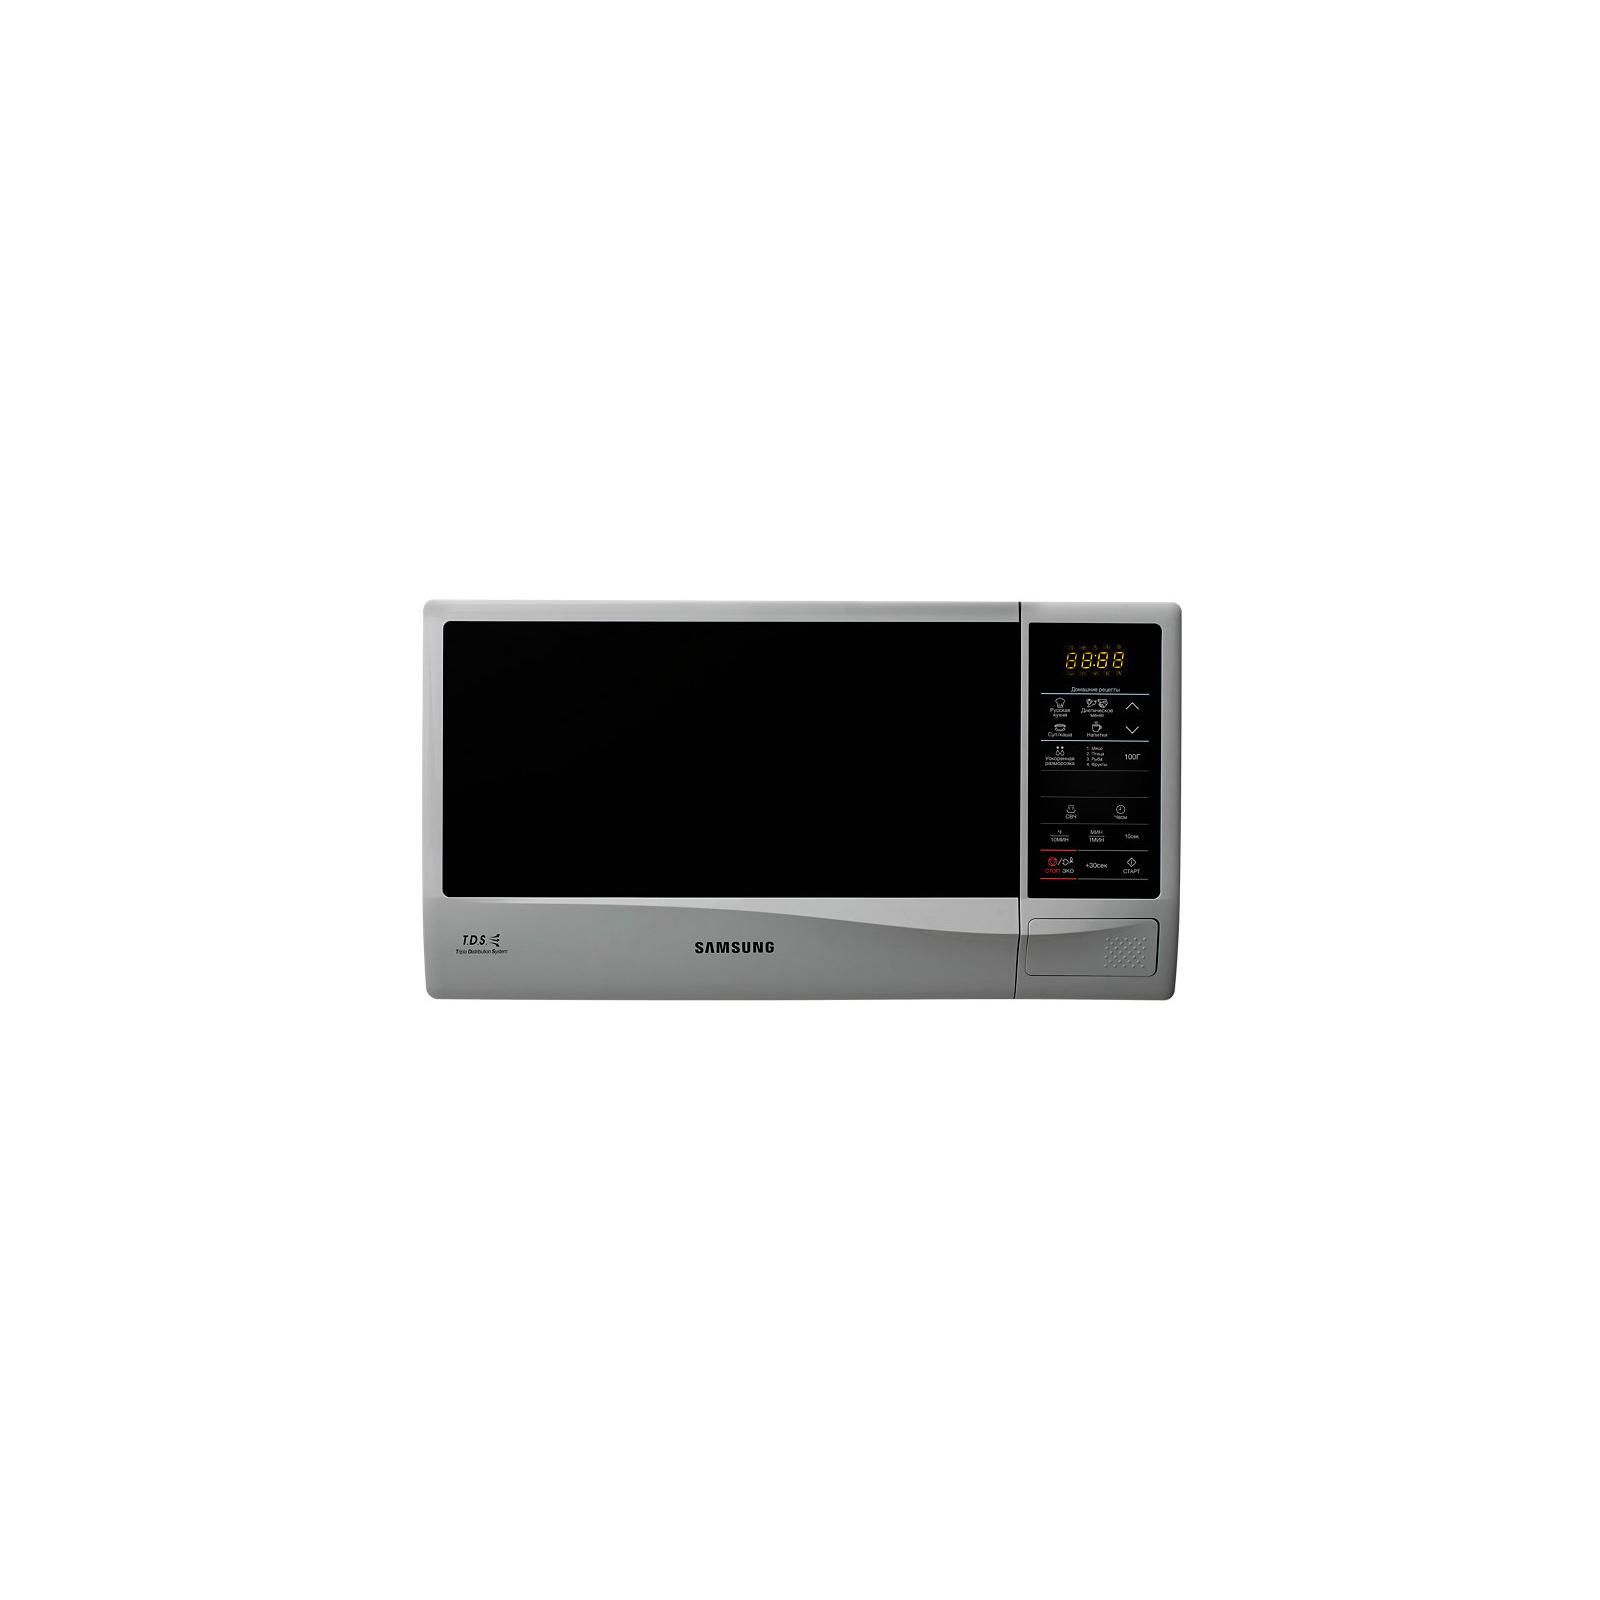 Микроволновая печь Samsung ME 83 KRS-2/BW (ME83KRS-2/BW)